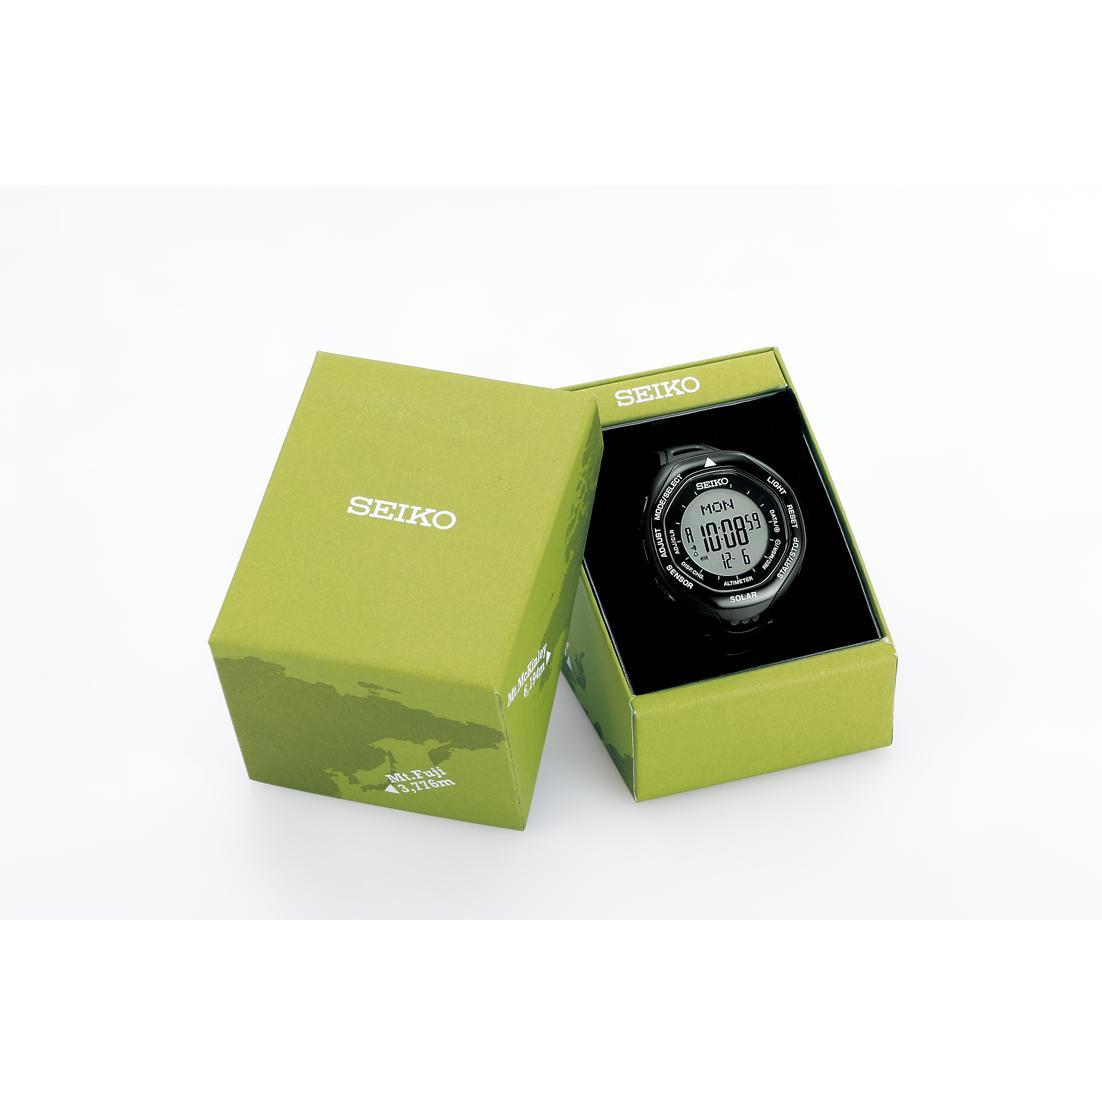 SEIKO セイコー PROSPEX プロスペックスSBEB001 S822 アルピニスト 【正規販売店】